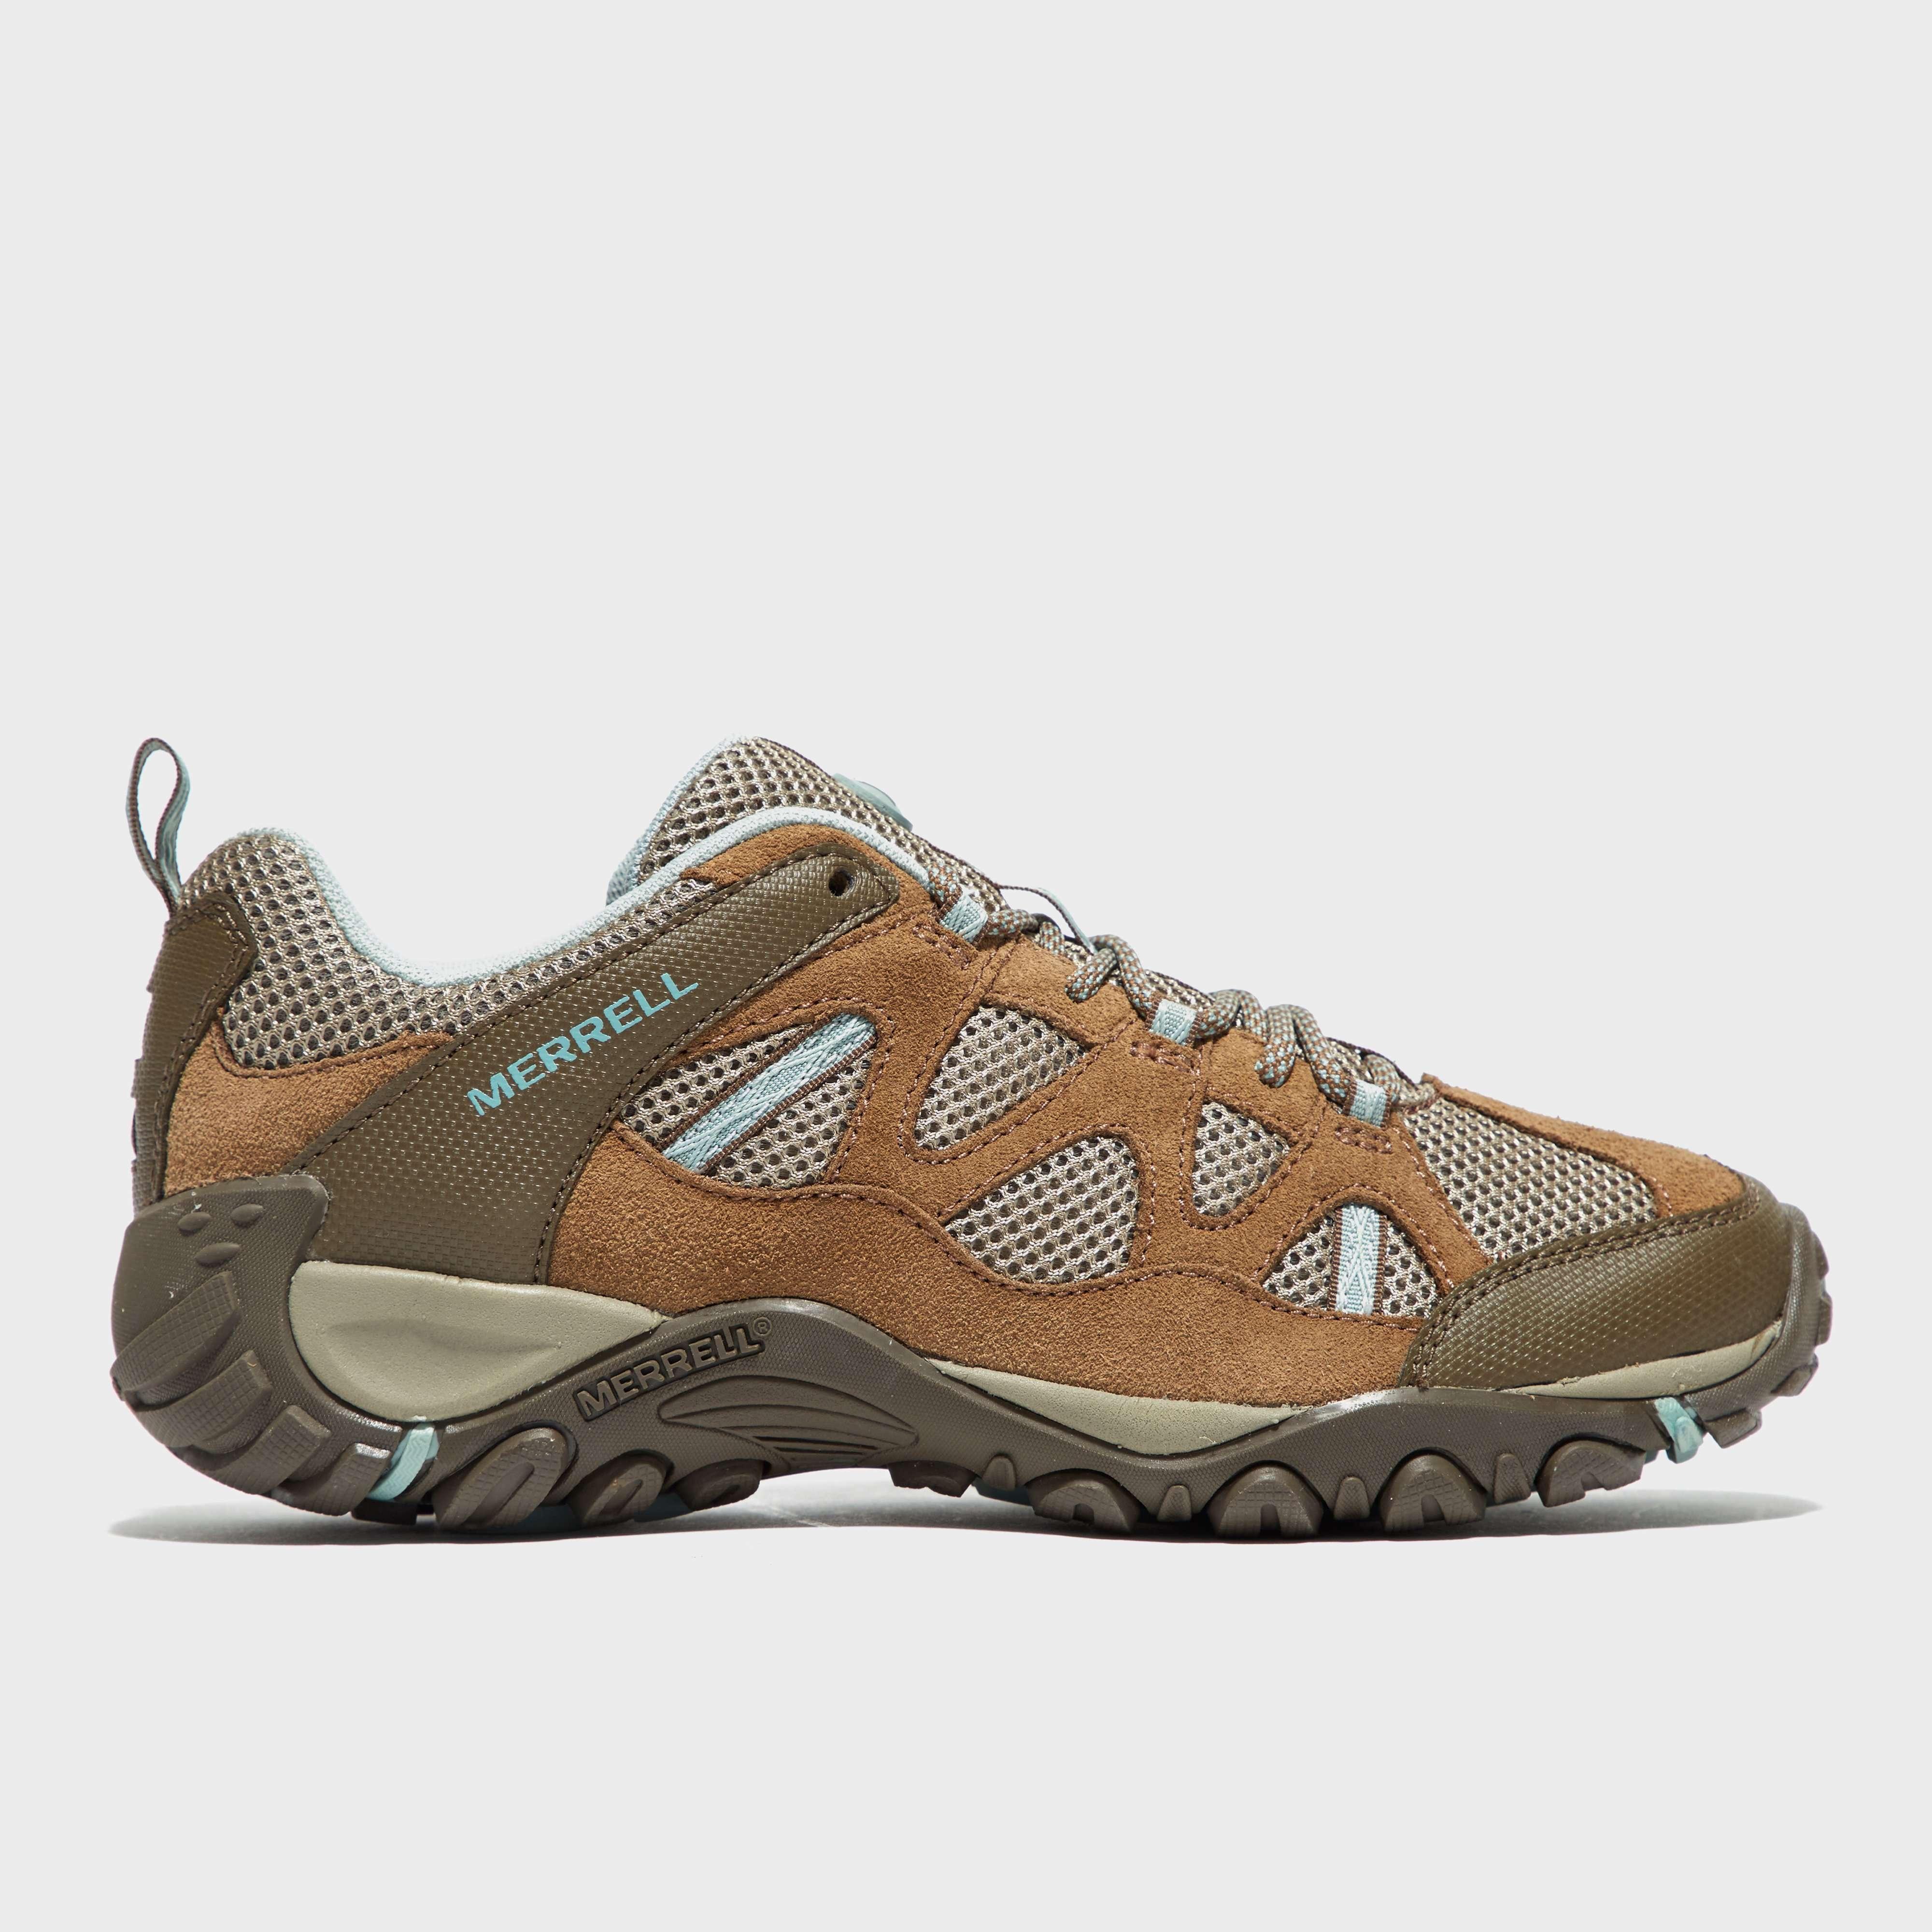 MERRELL Women's Yokota Trail Ventilator Hiking Shoe